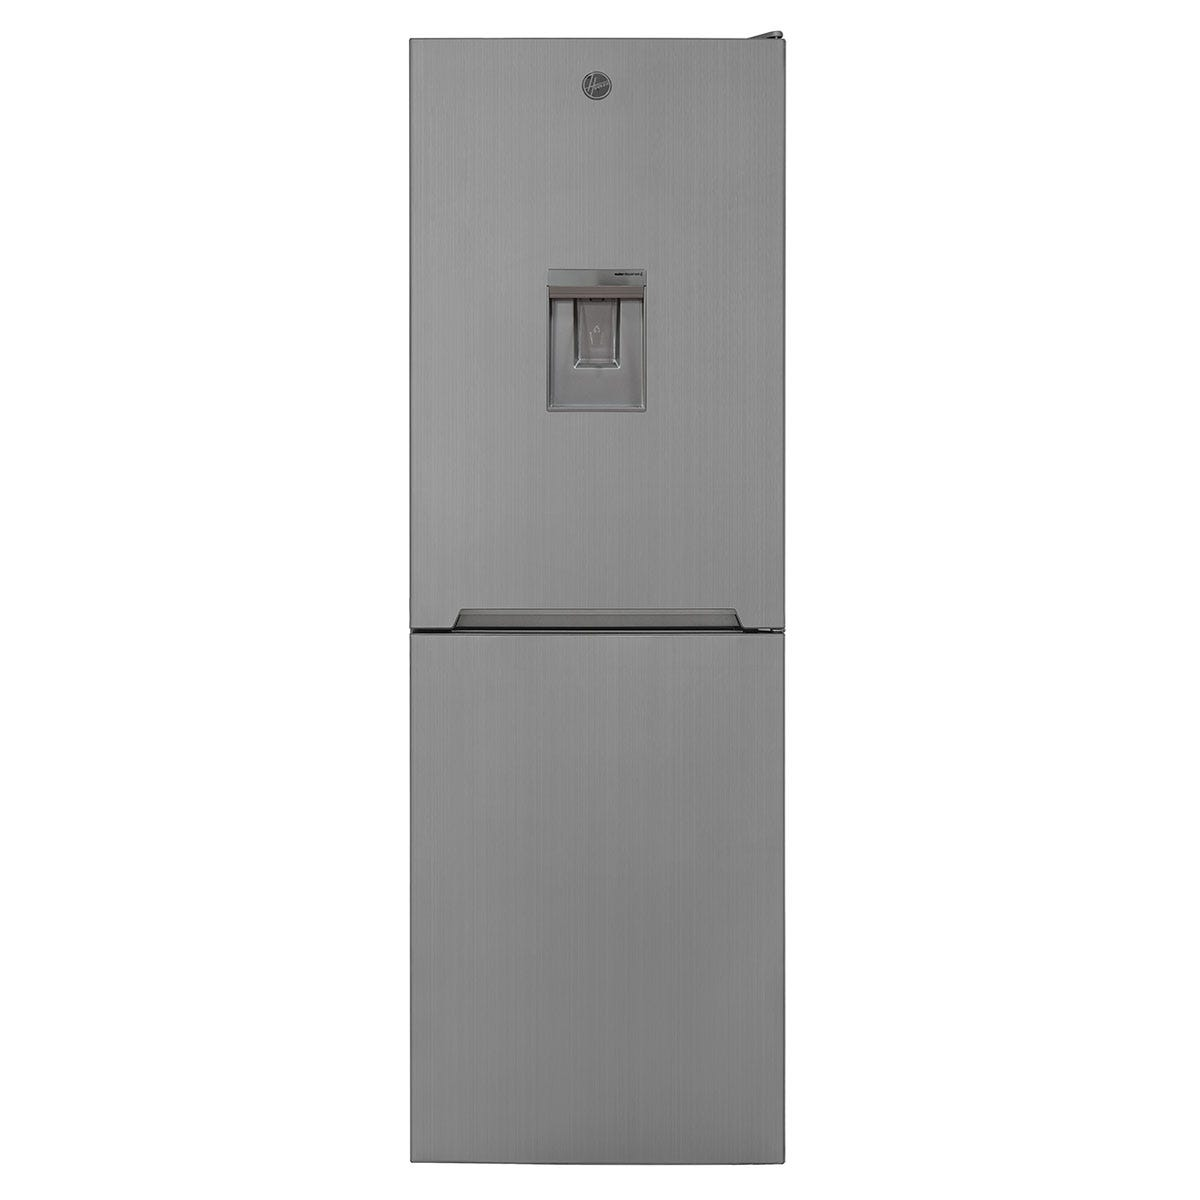 Hoover HVNB 618FX5WDK 323L 60cm Total No Frost Fridge Freezer - Stainless Steel